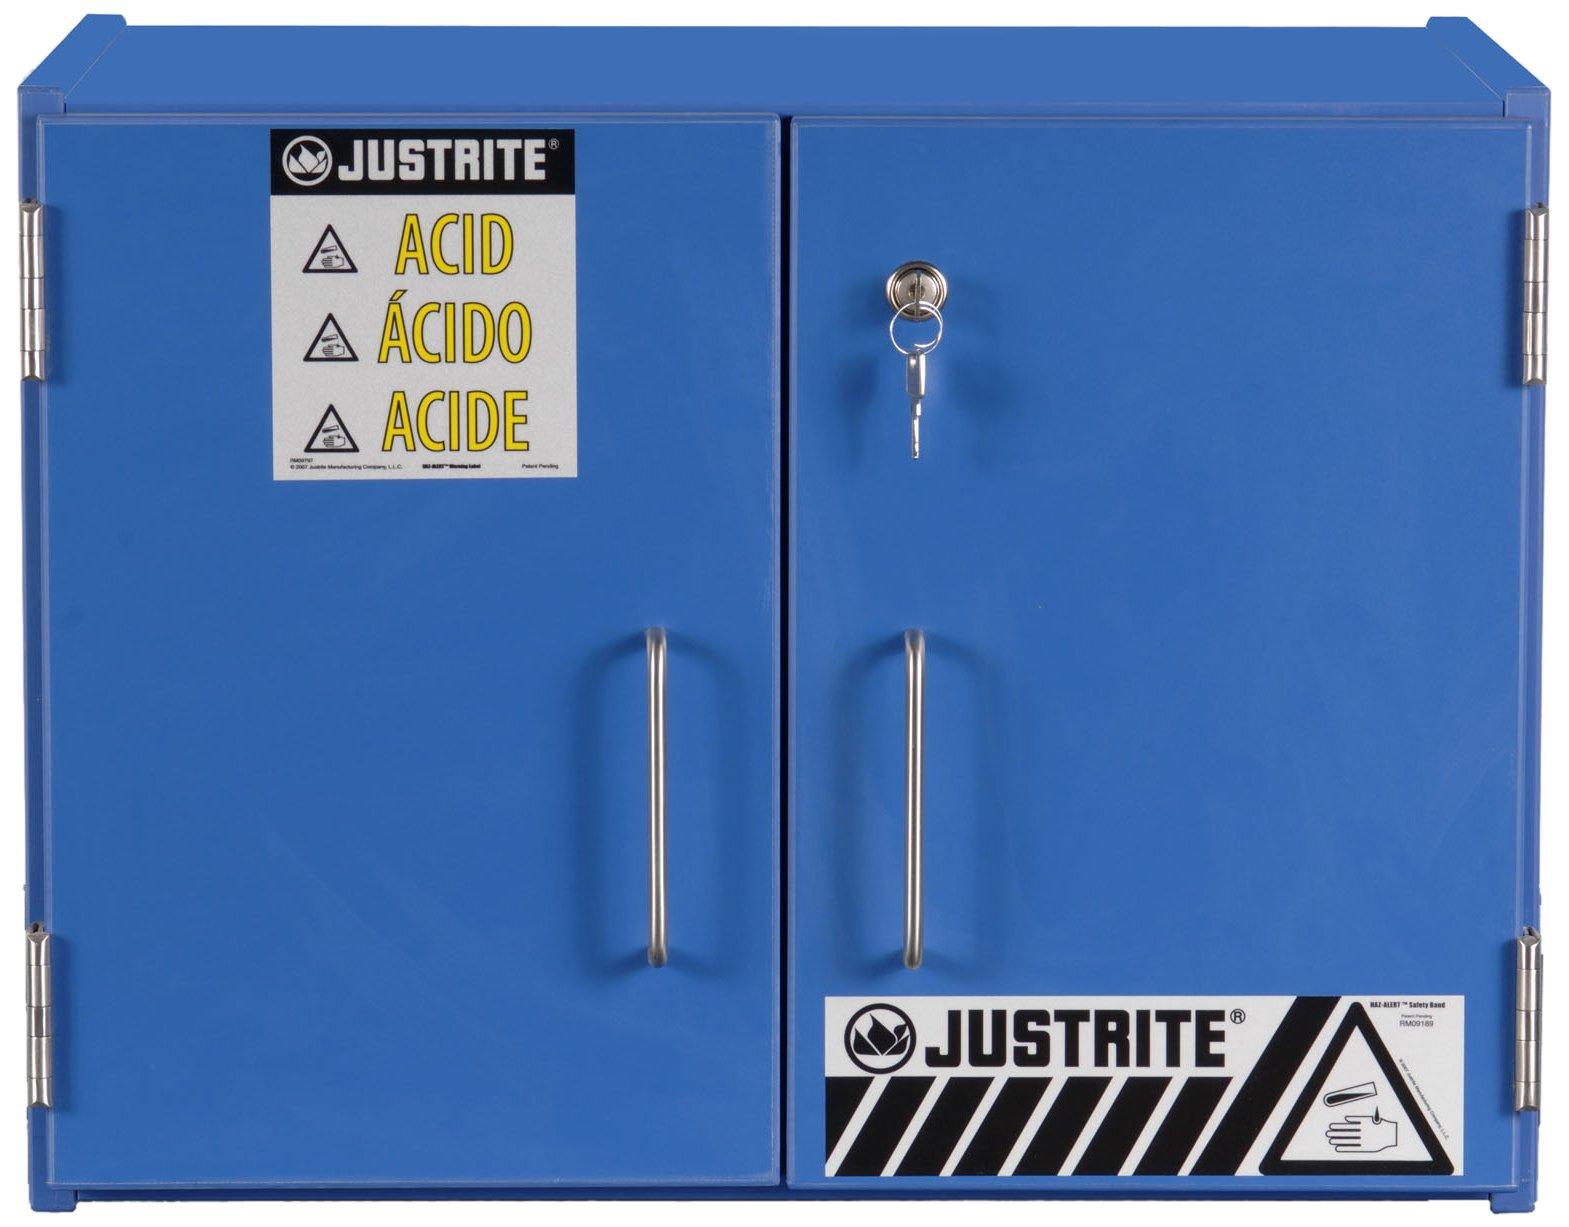 Justrite 24120 6 - 2 1/2 Liter Bottles, 18 3/8'' x 24'' x 15 7/8'', Two Sliding Doors Corrosive Storage Non-Metallic Cabinets